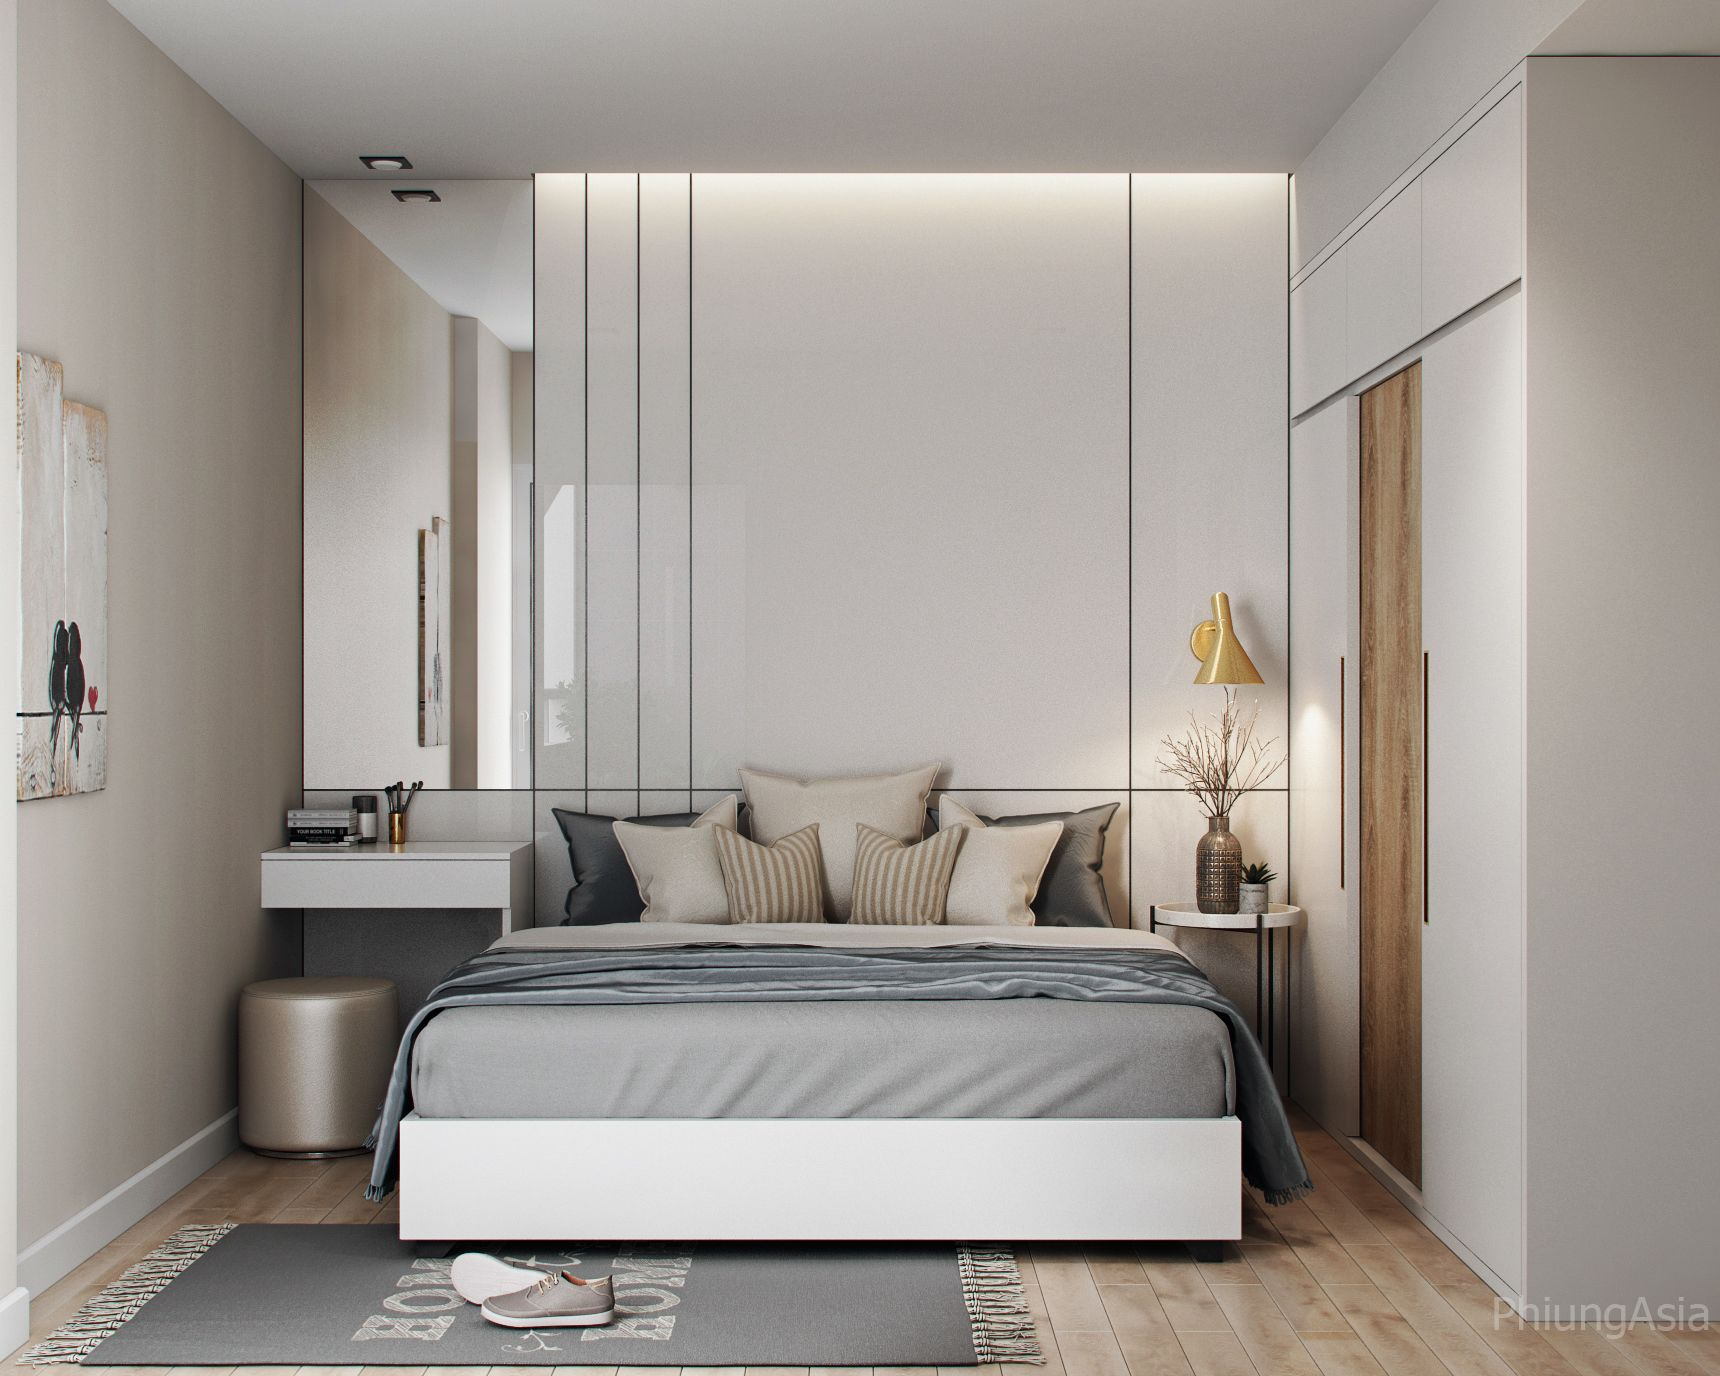 Behance Gallery 42648613 60m2 Apartment 1 Bedroom